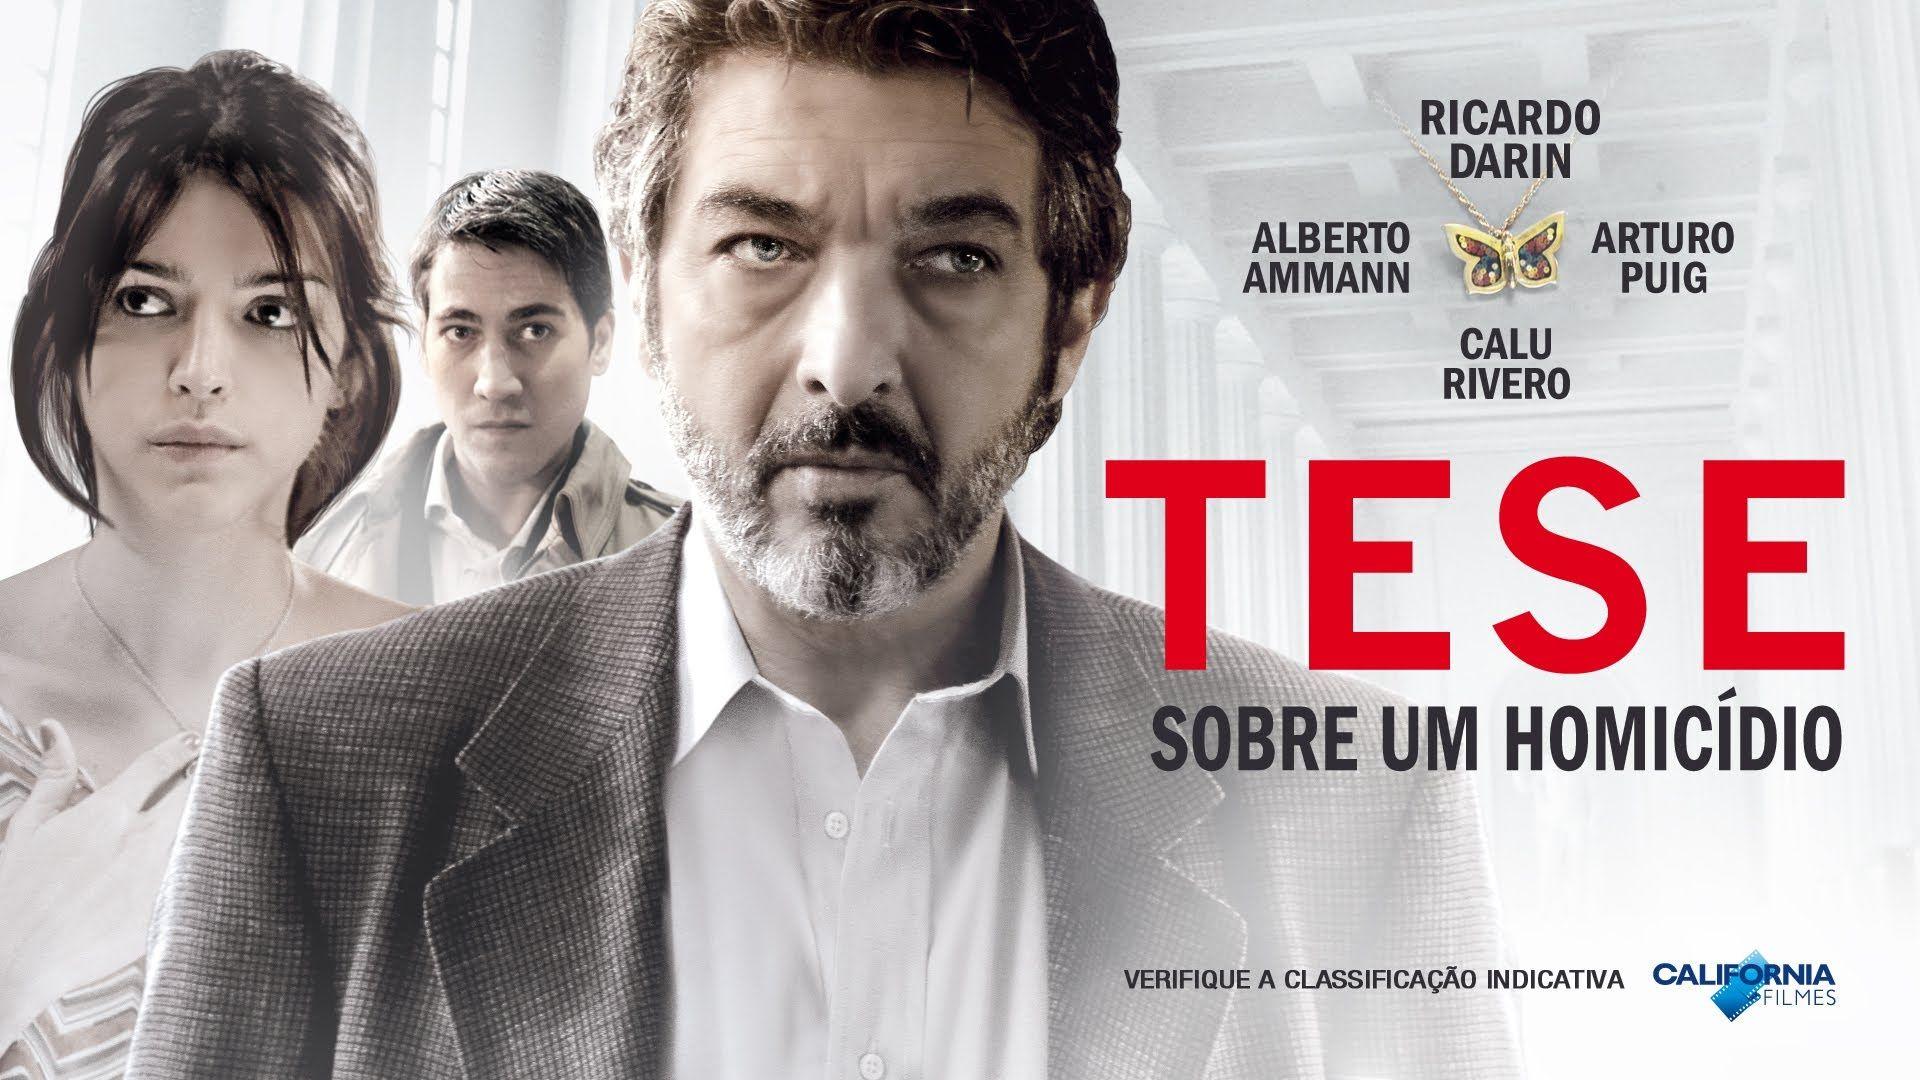 Tese sobre um homicídio – Cinema